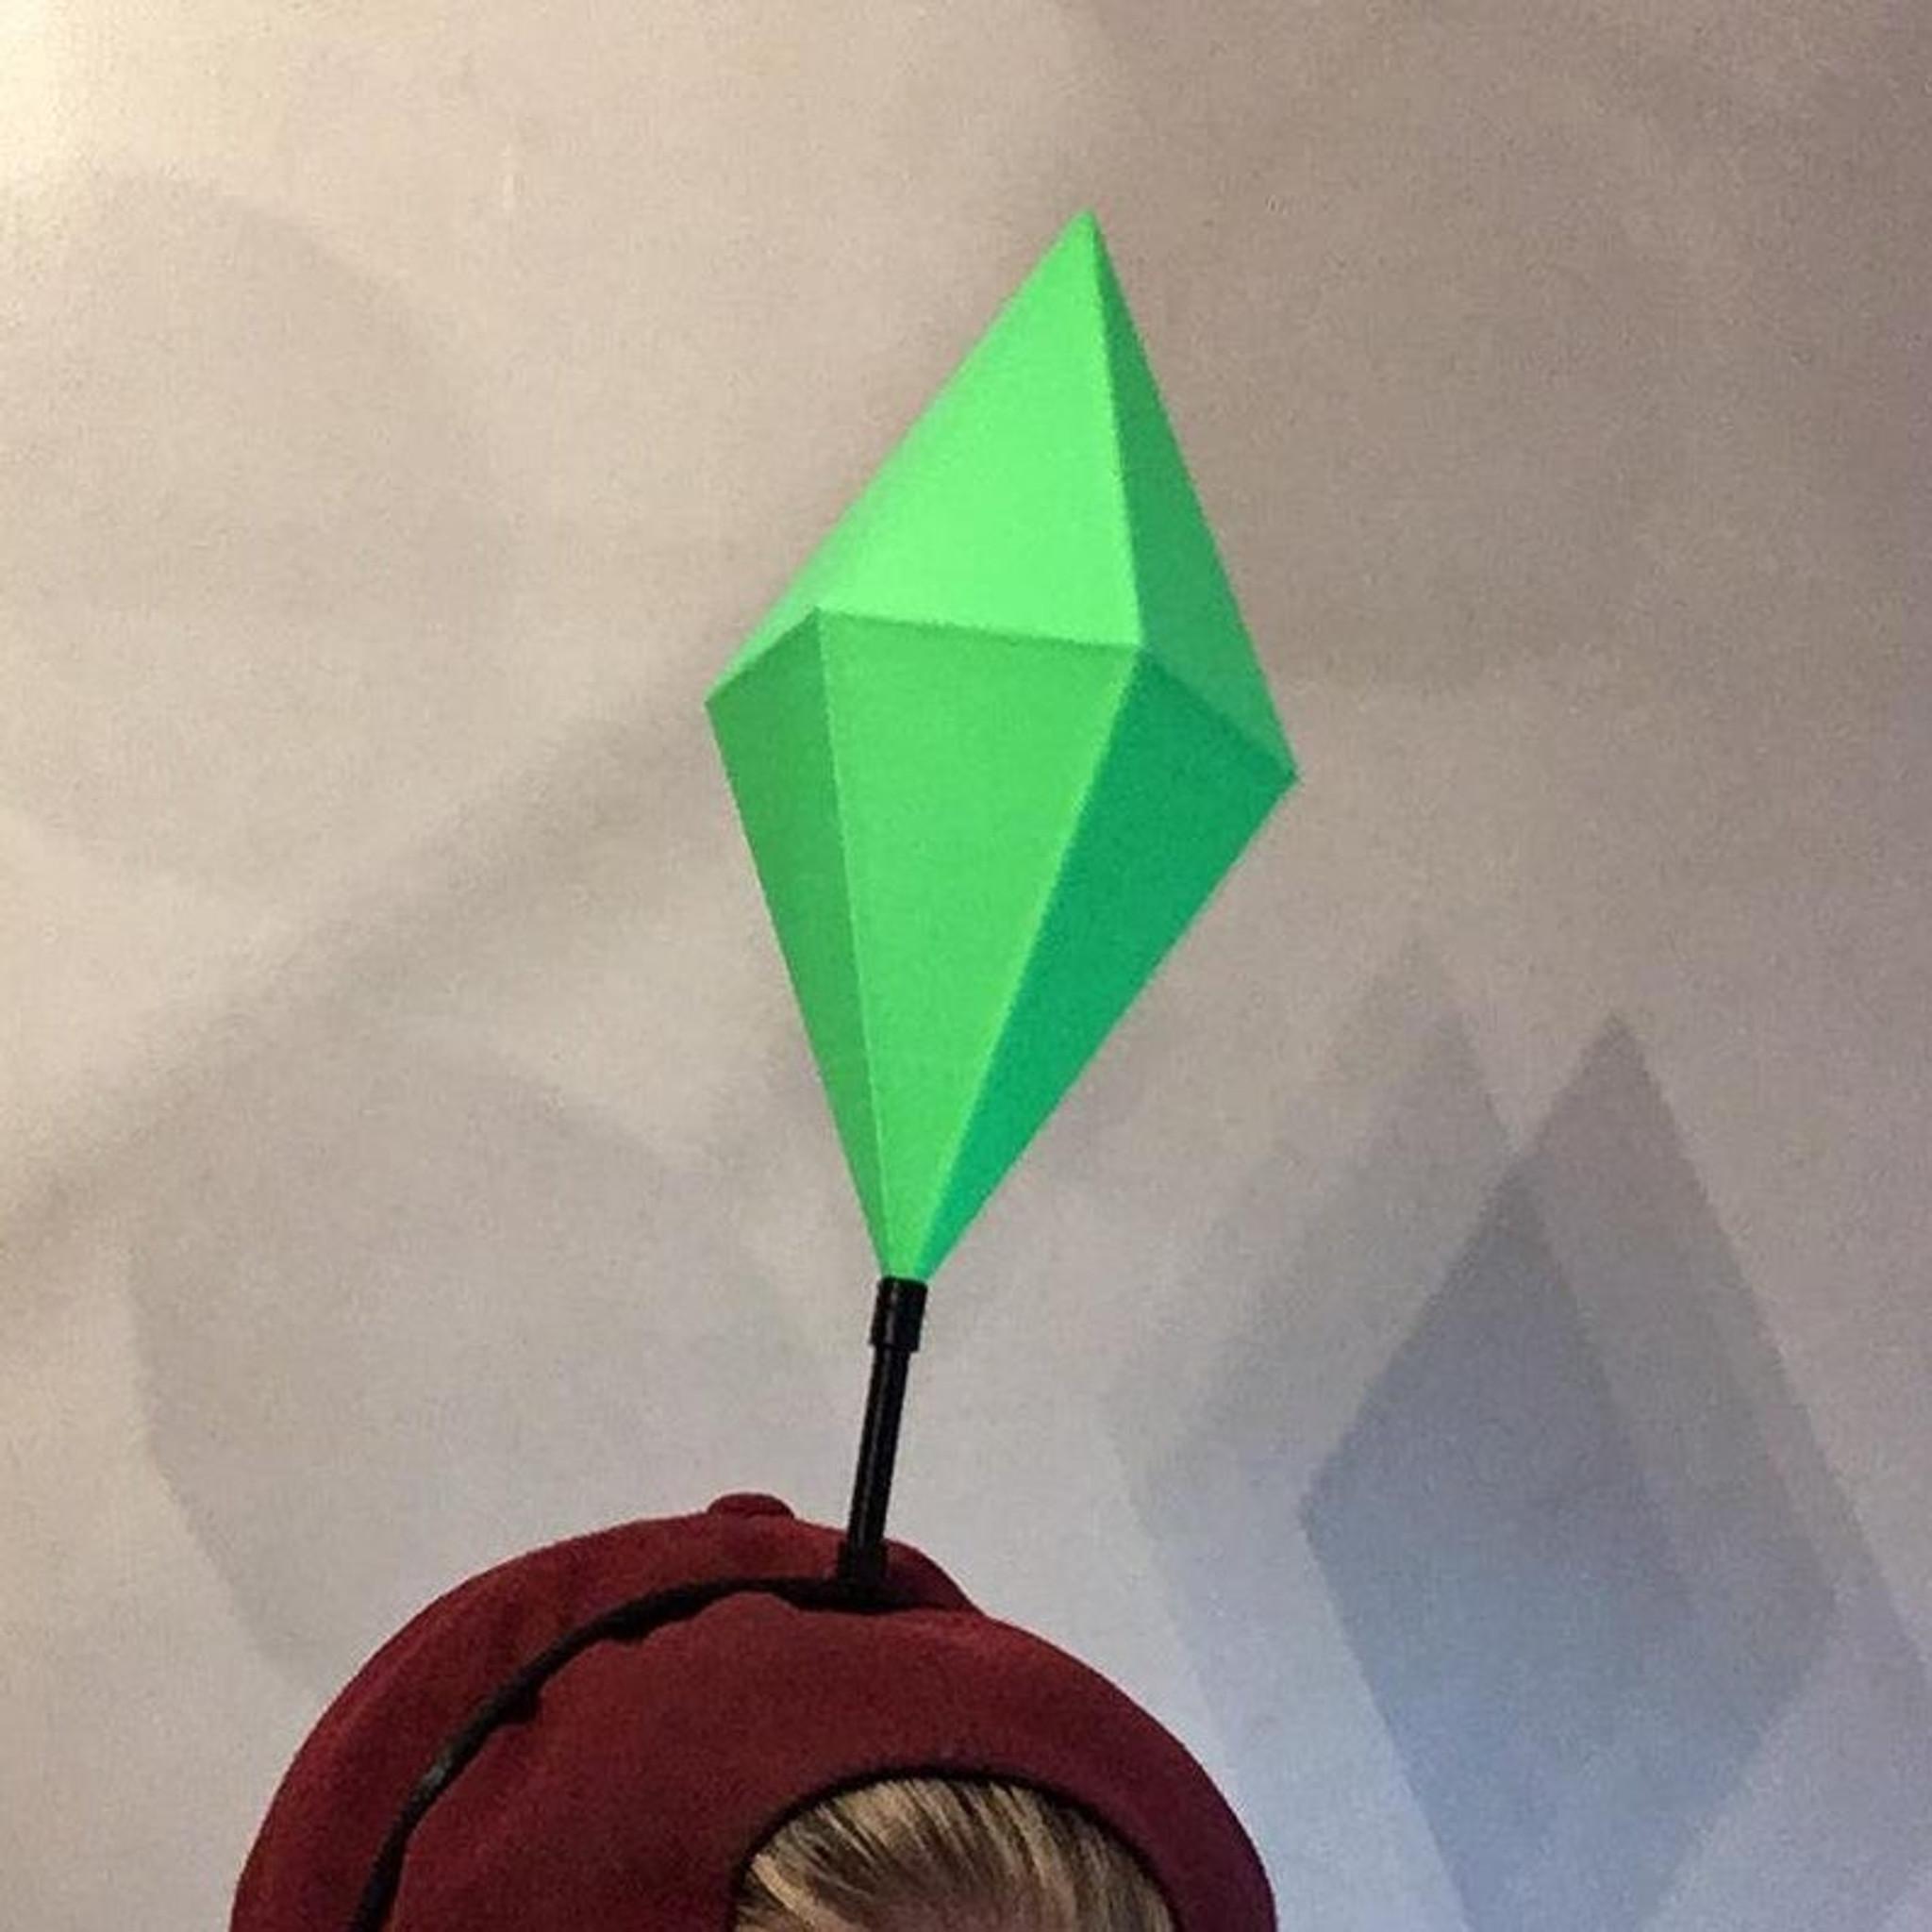 Sims Plumbob Icon Led Headband I Give Cool Gifts